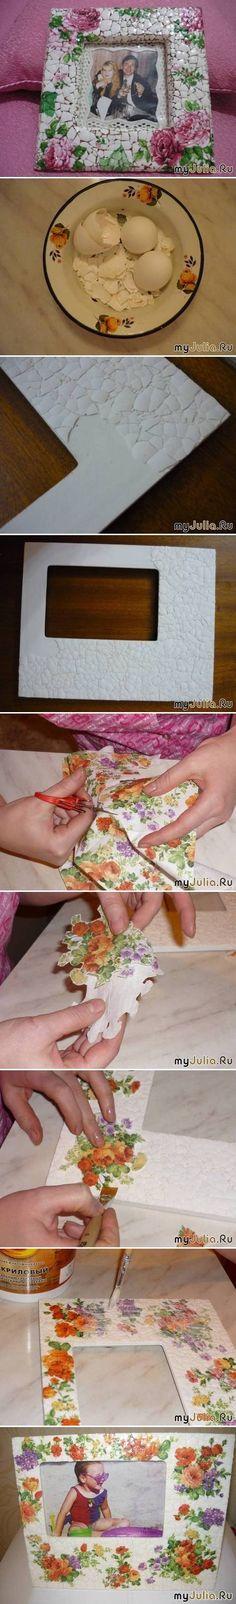 DIY Eggshell Mosaic Picture Frame DIY Eggshell Mosaic Picture Frame by catrulz